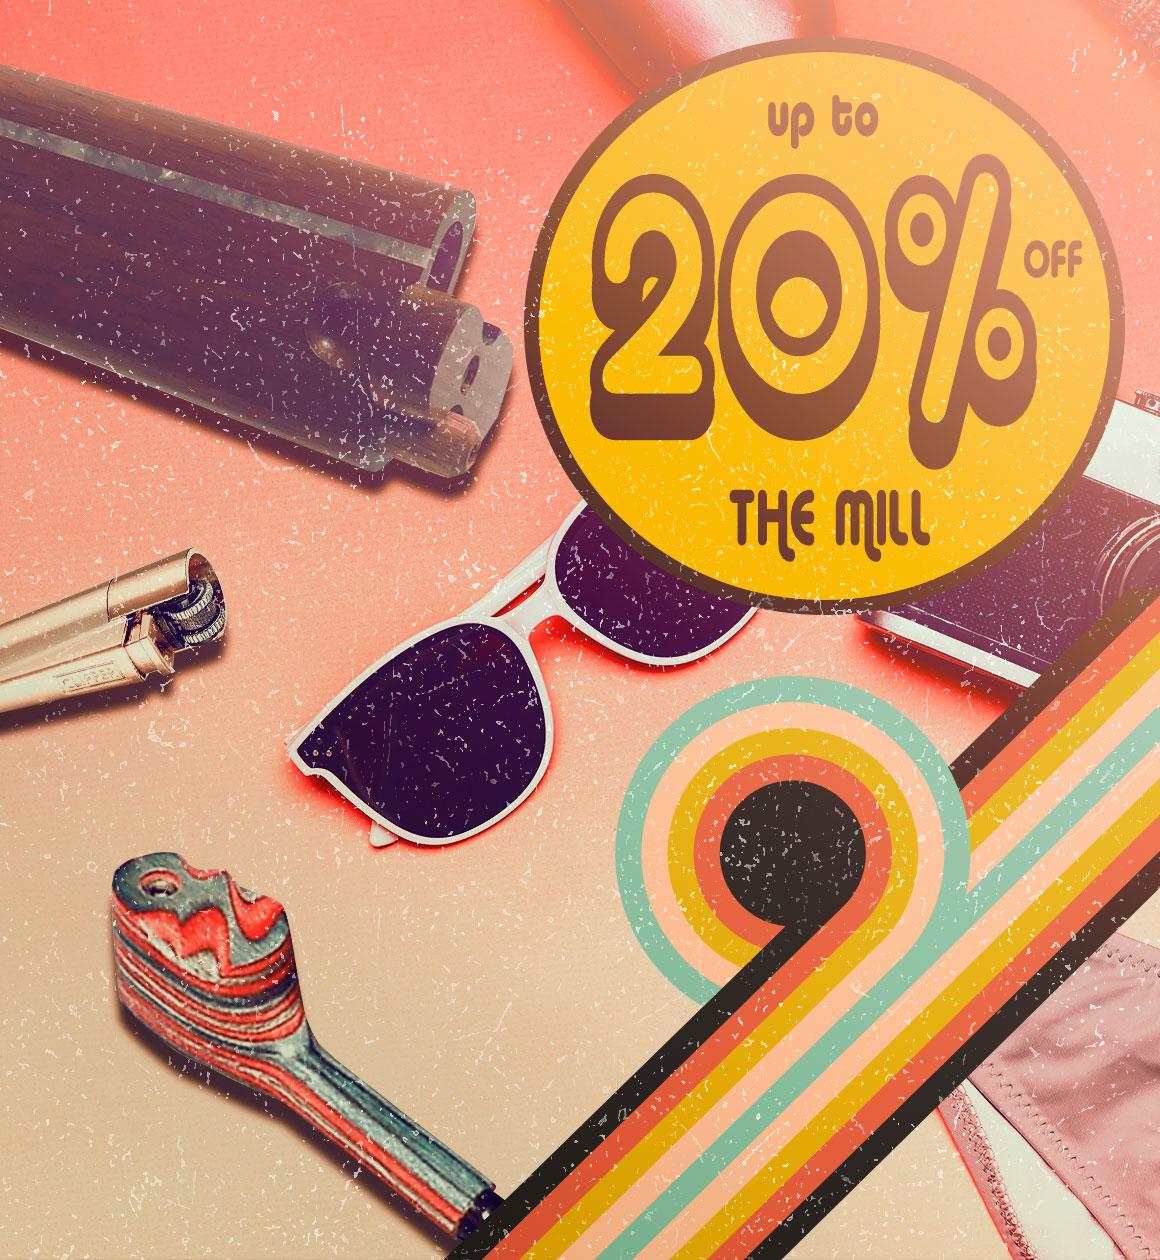 humble-retro-themill-sale.jpg